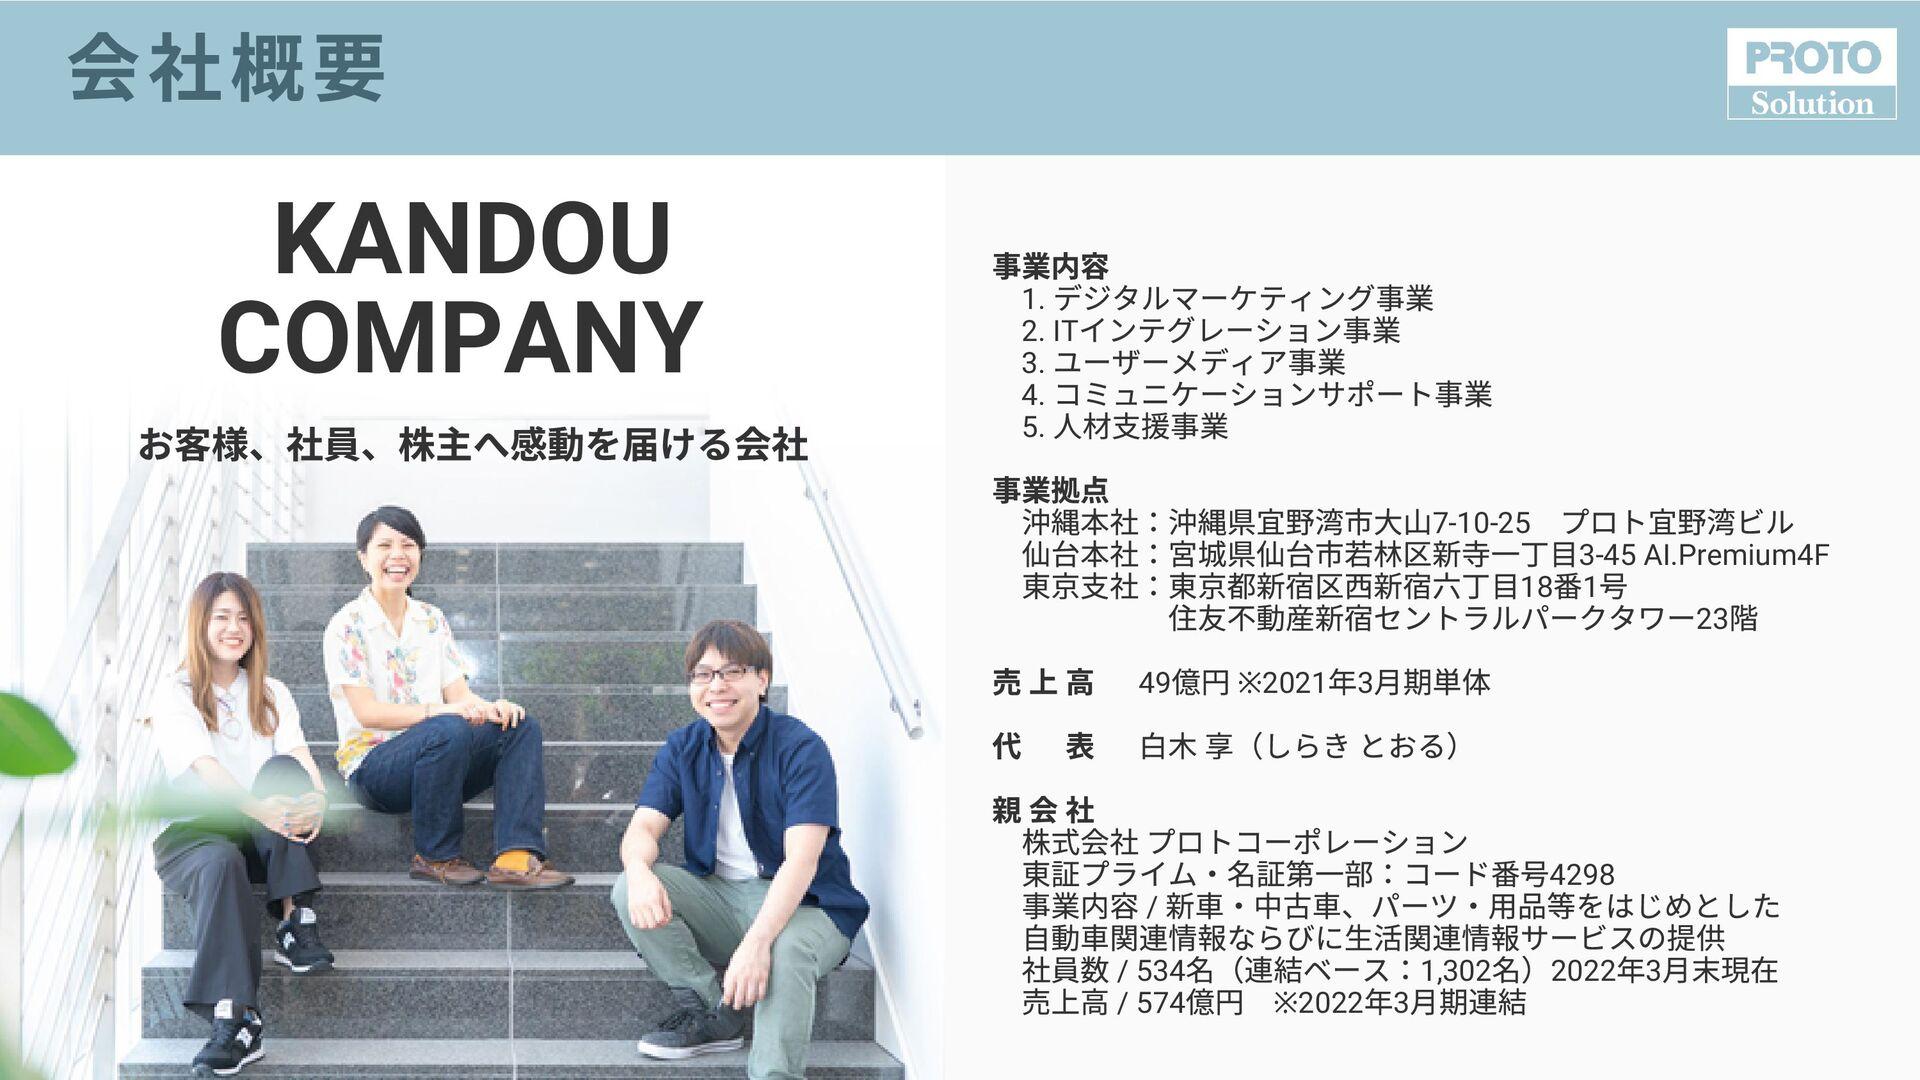 KANDOU COMPANY お 、 員、株主へ 動を ける 事業内 1. デジタルマーケティ...